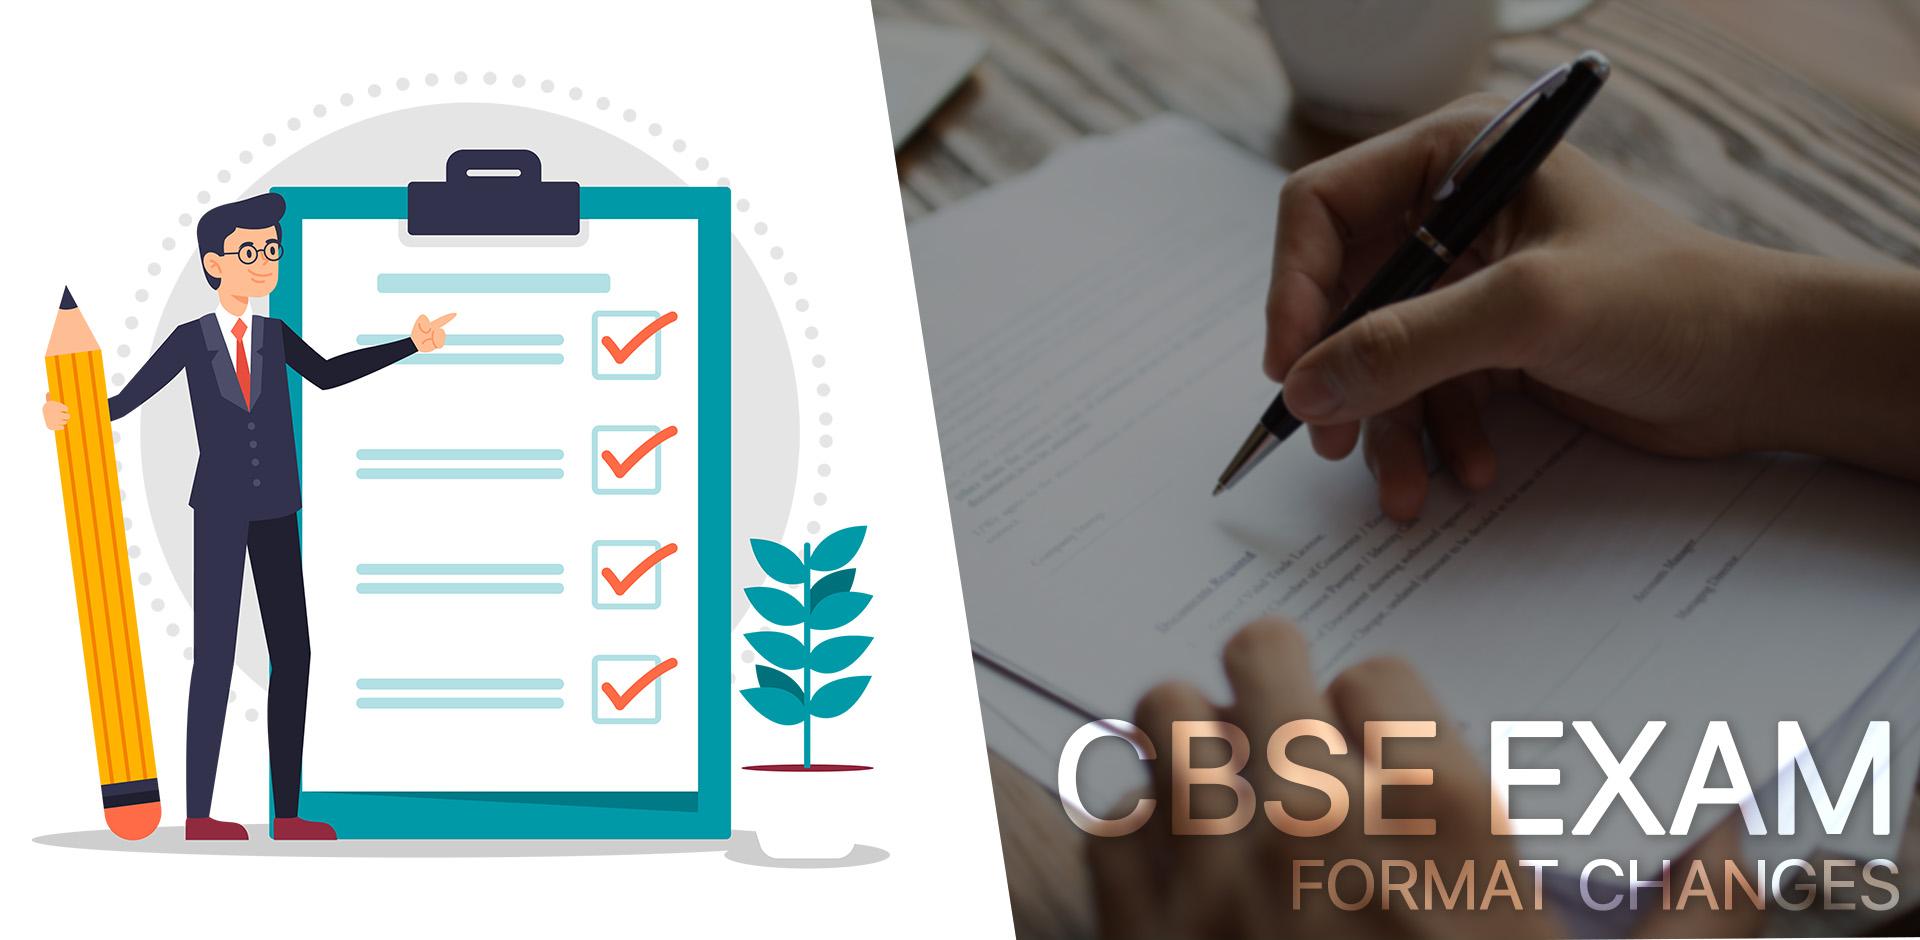 CBSE Exam Format Changes